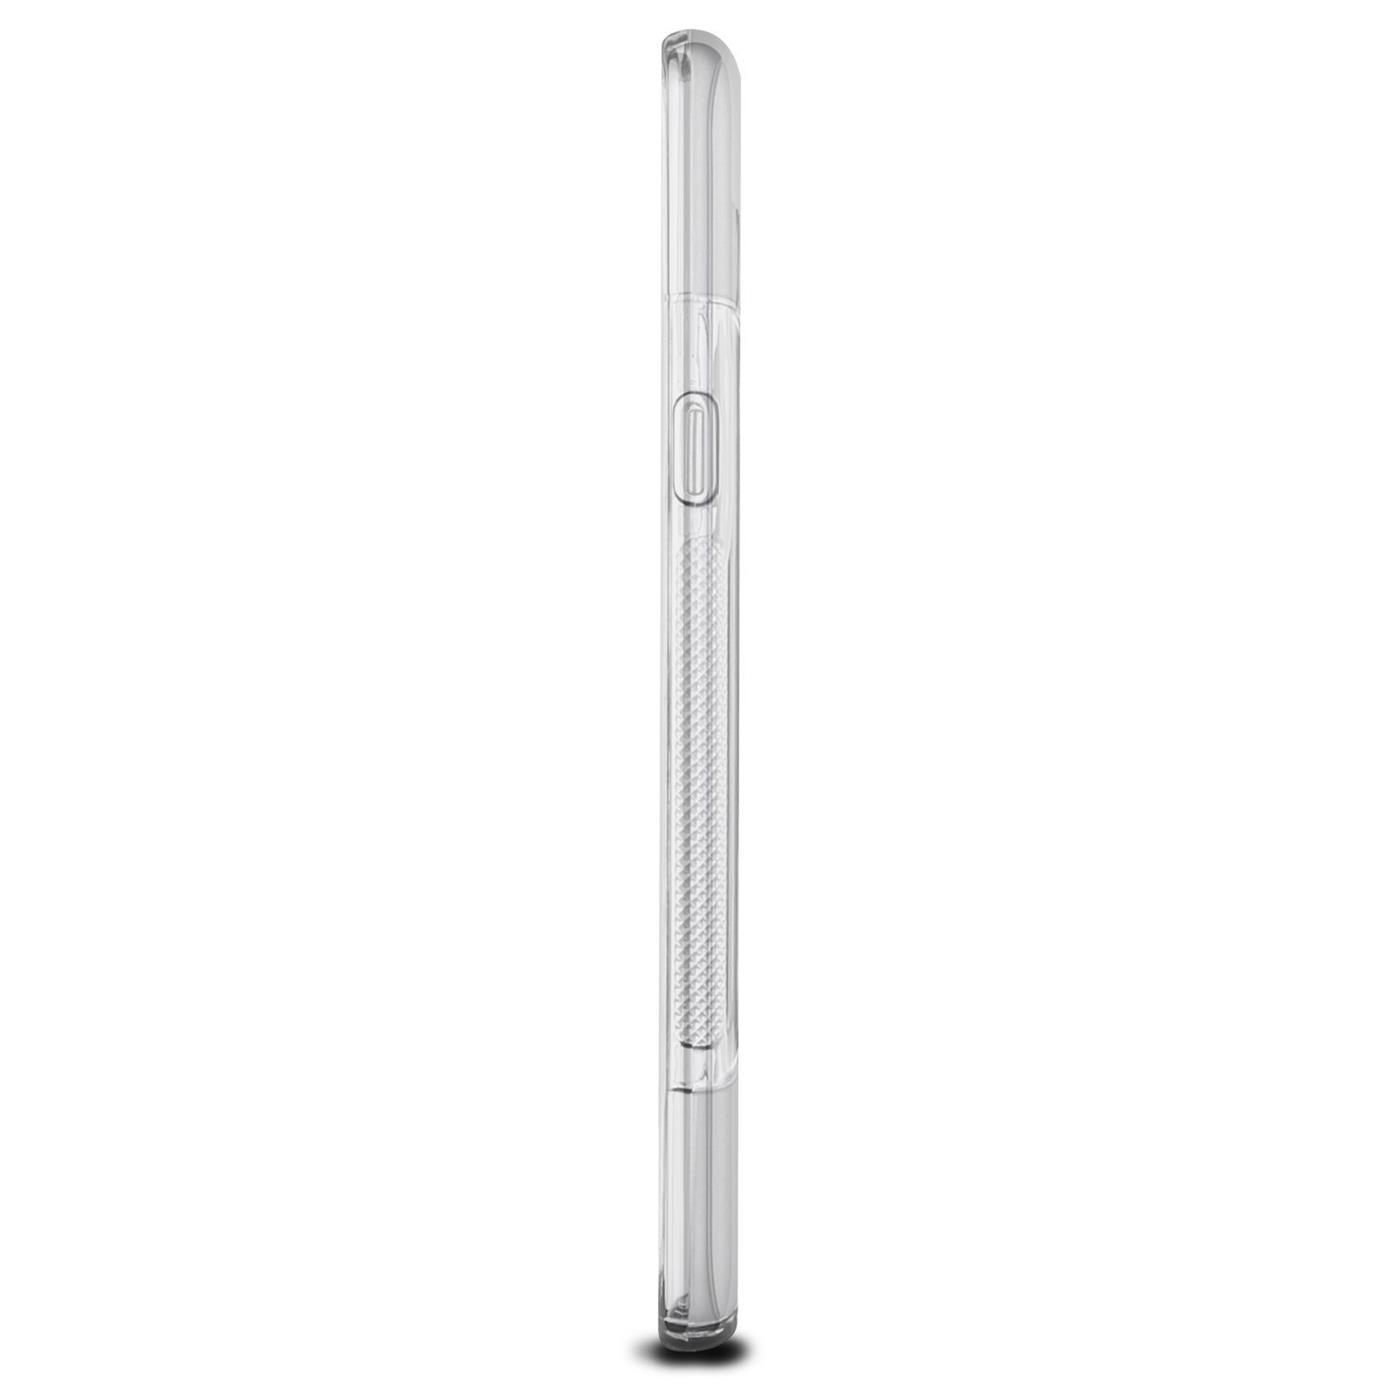 Samsung-Galaxy-j7-2016-Silikon-Gel-S-Line-Case-Cover-Duenn-Slim-Back-Bumper Indexbild 25